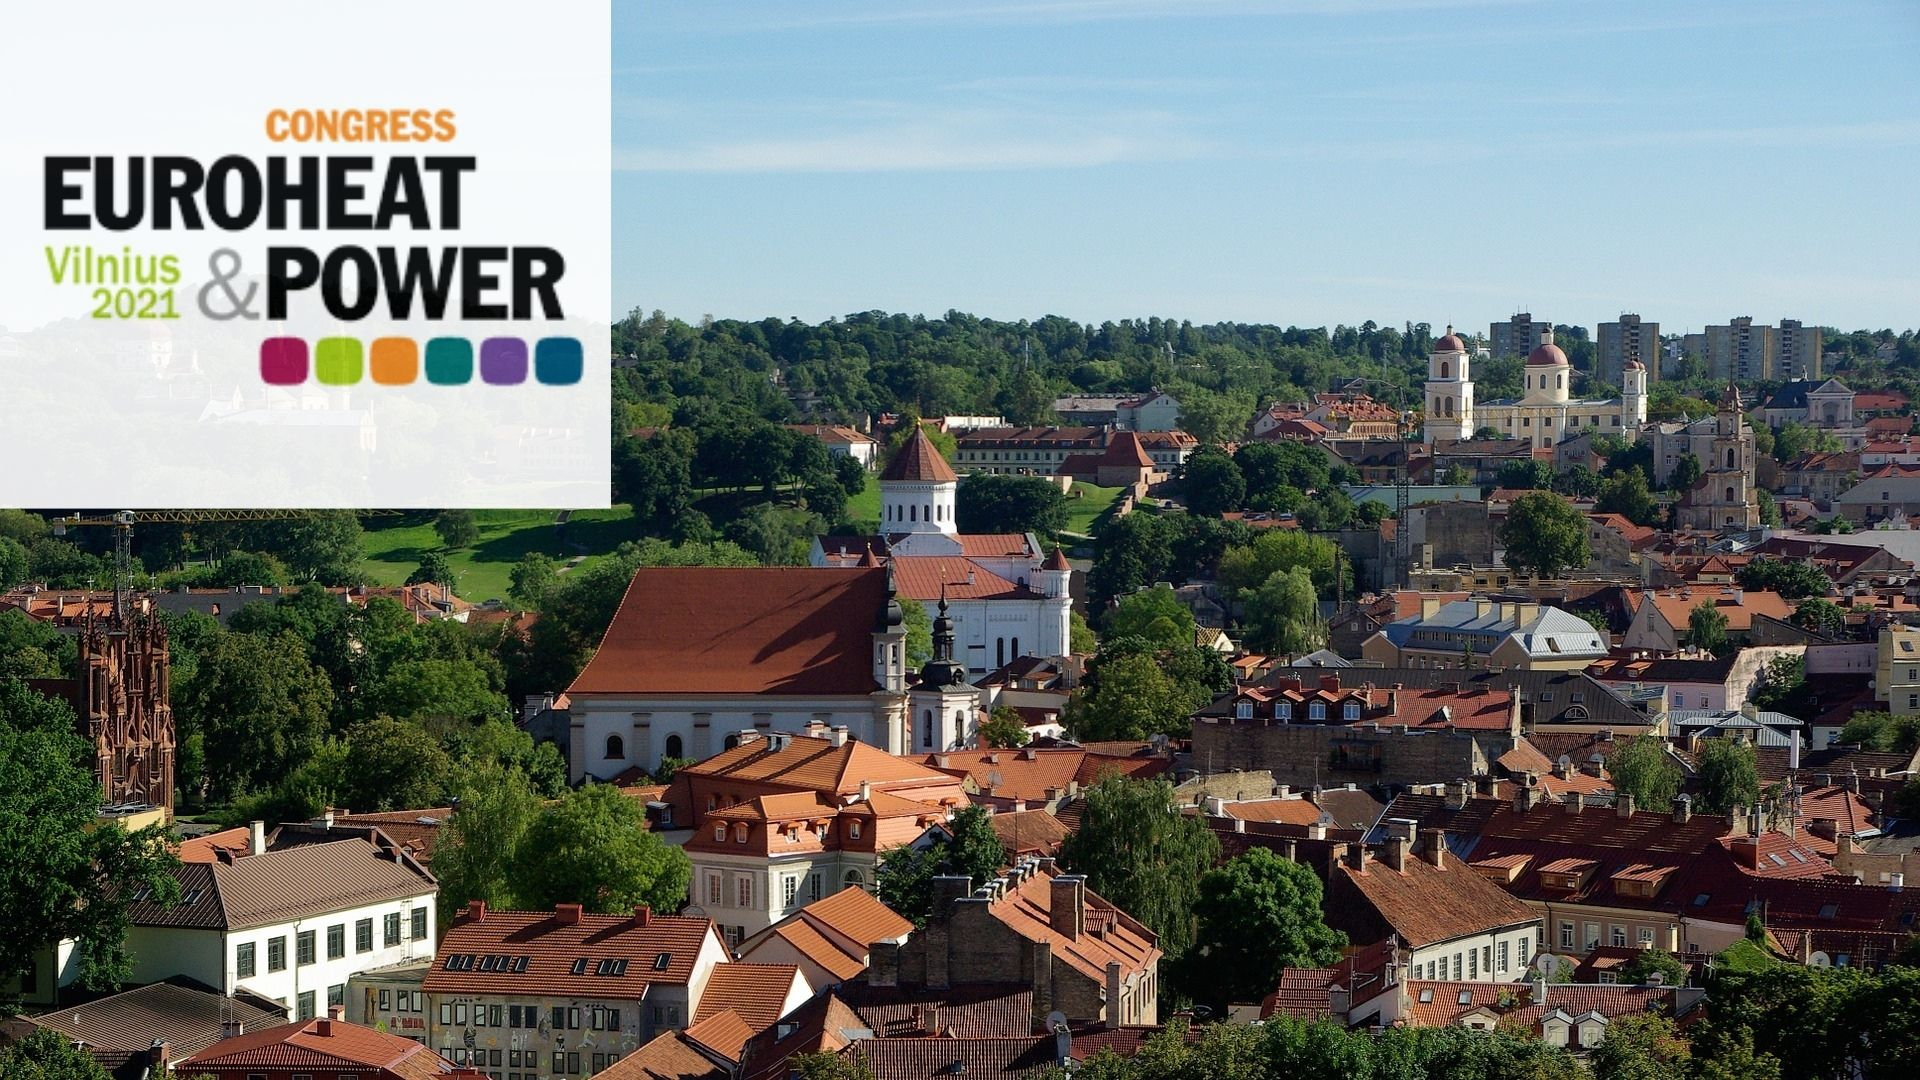 40th Euroheat & Power Congress